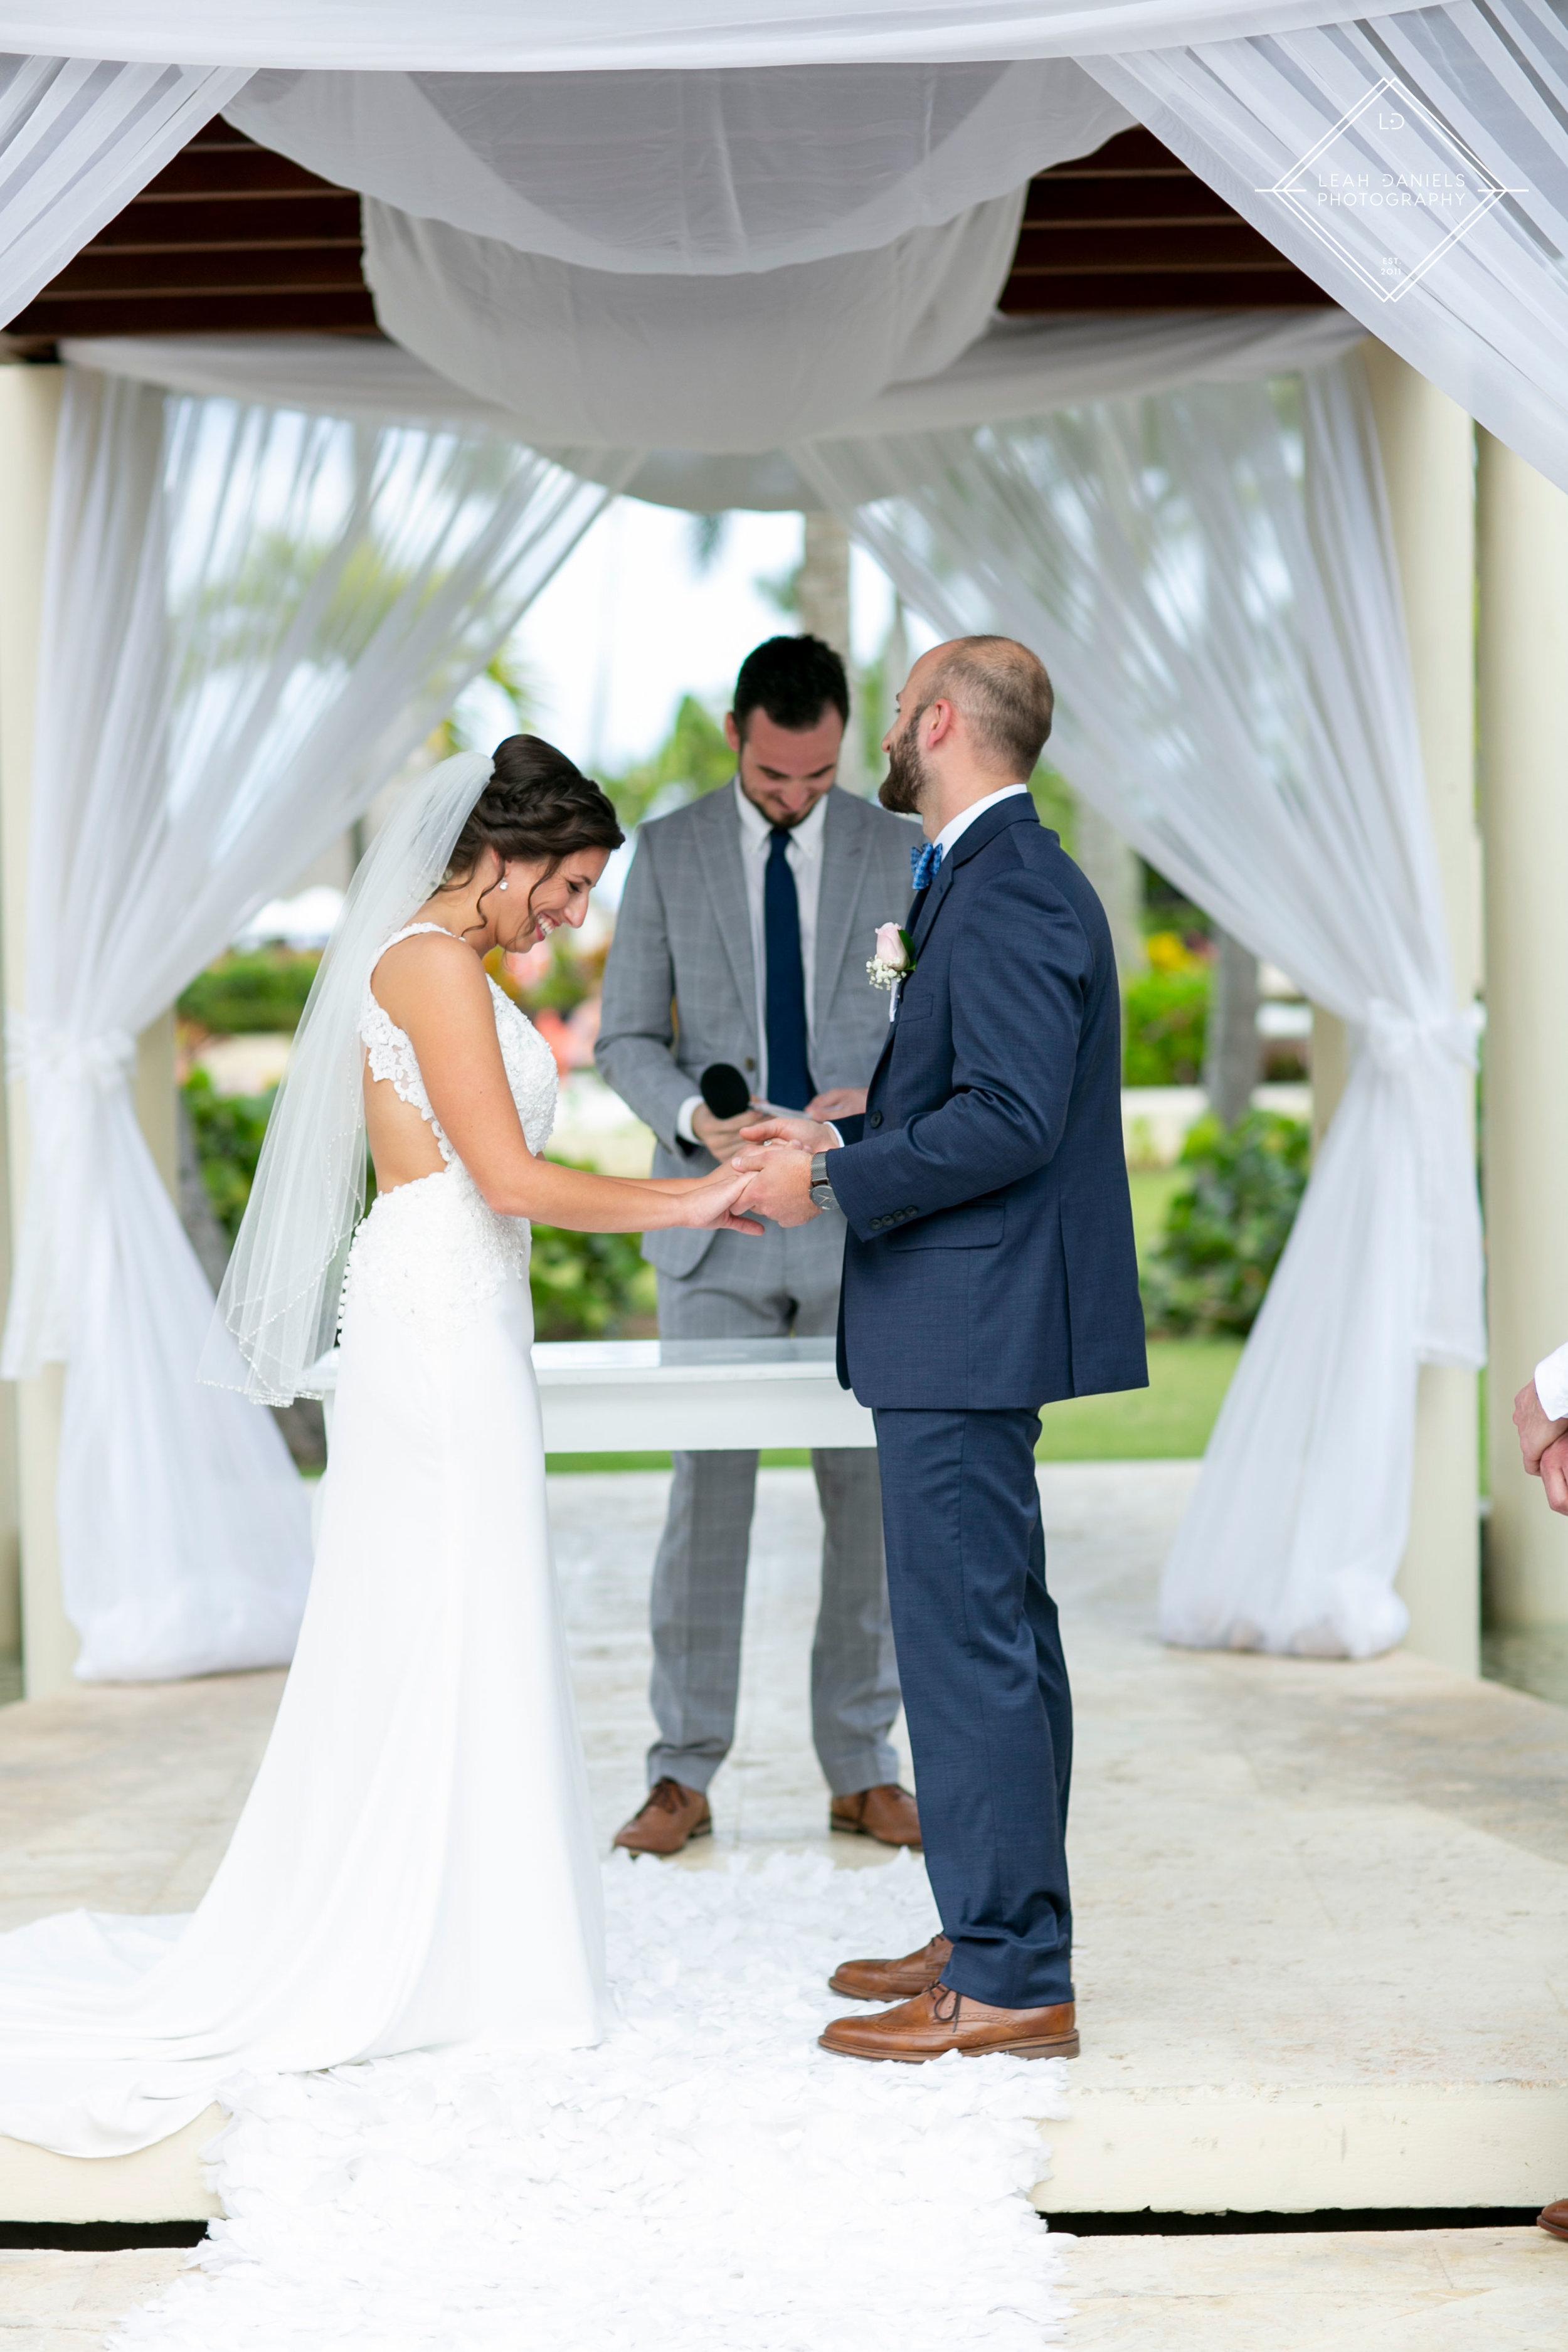 NOW Larimar Destination Wedding; The ceremony